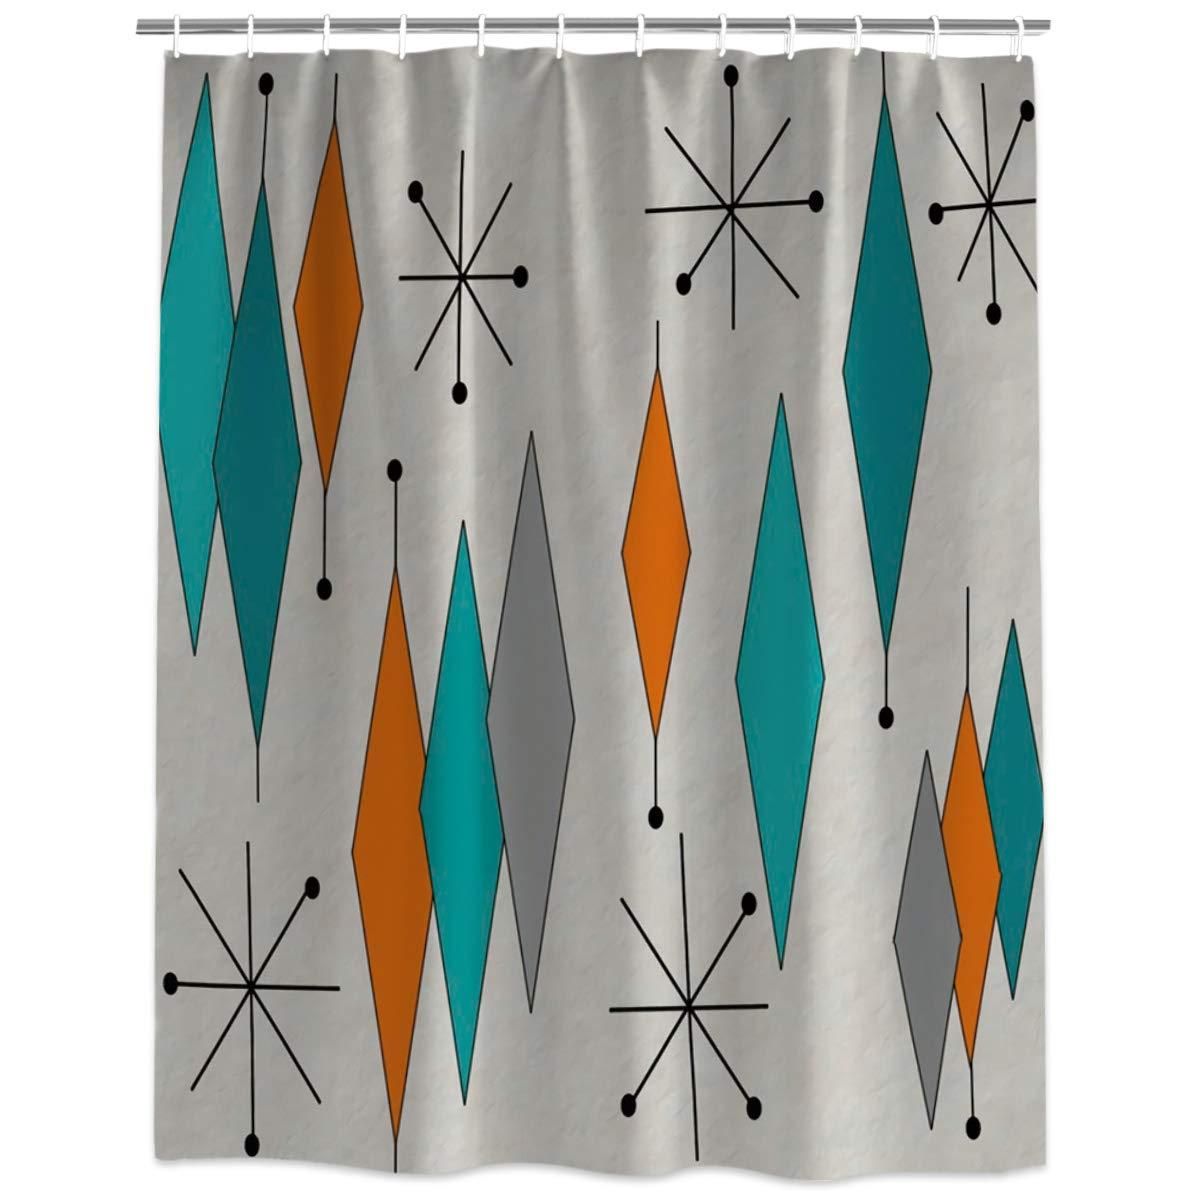 Cortina de ducha para baño, anillos de ducha de tela de poliéster impermeables con patrón de diamante moderno de mediados de siglo incluidos 66x72inch